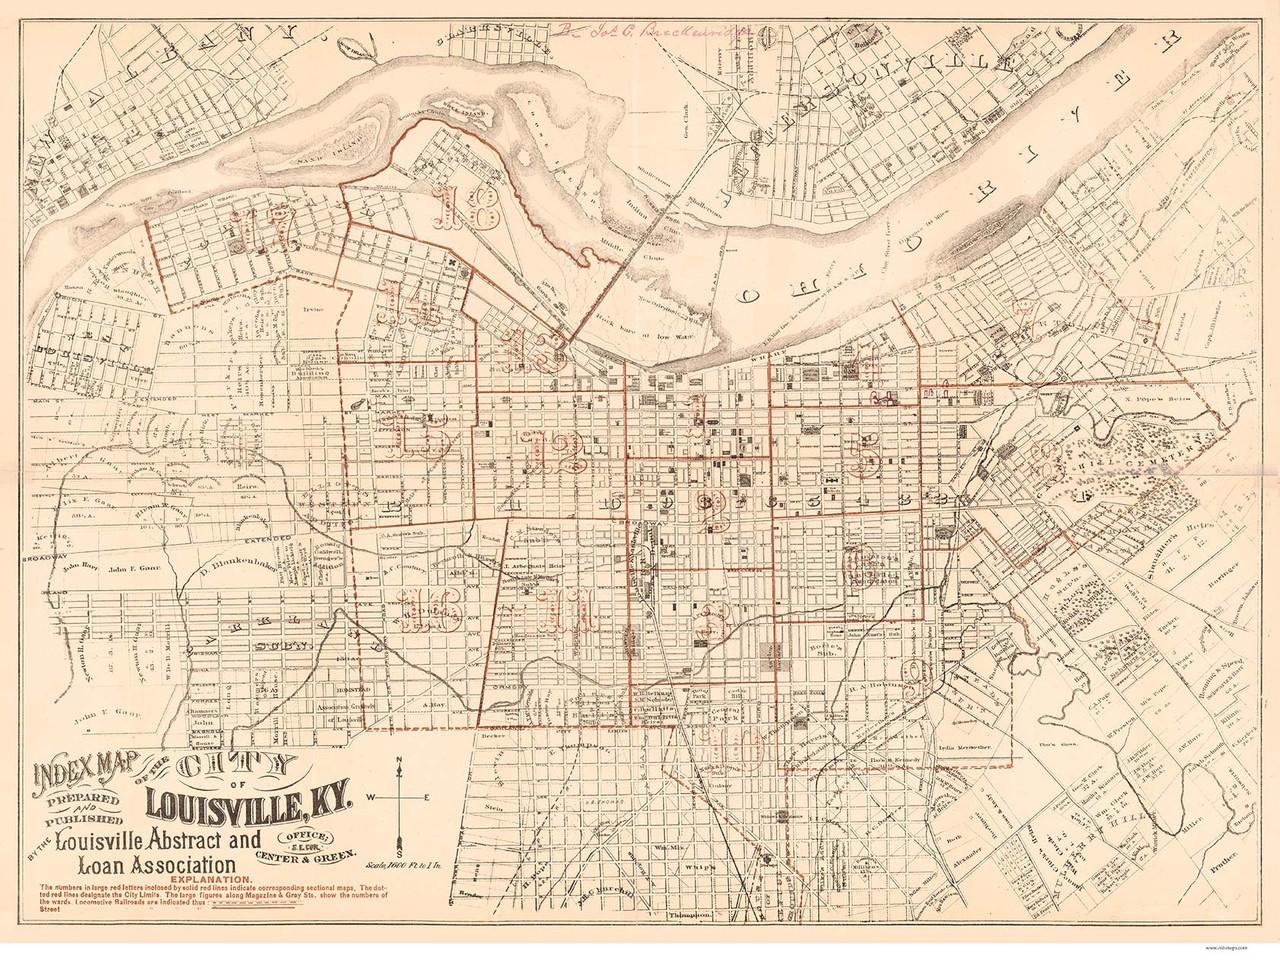 Louisville ca 1879 Louisville Abstract and Loan Association - Old Map  Reprint - Kentucky Cities